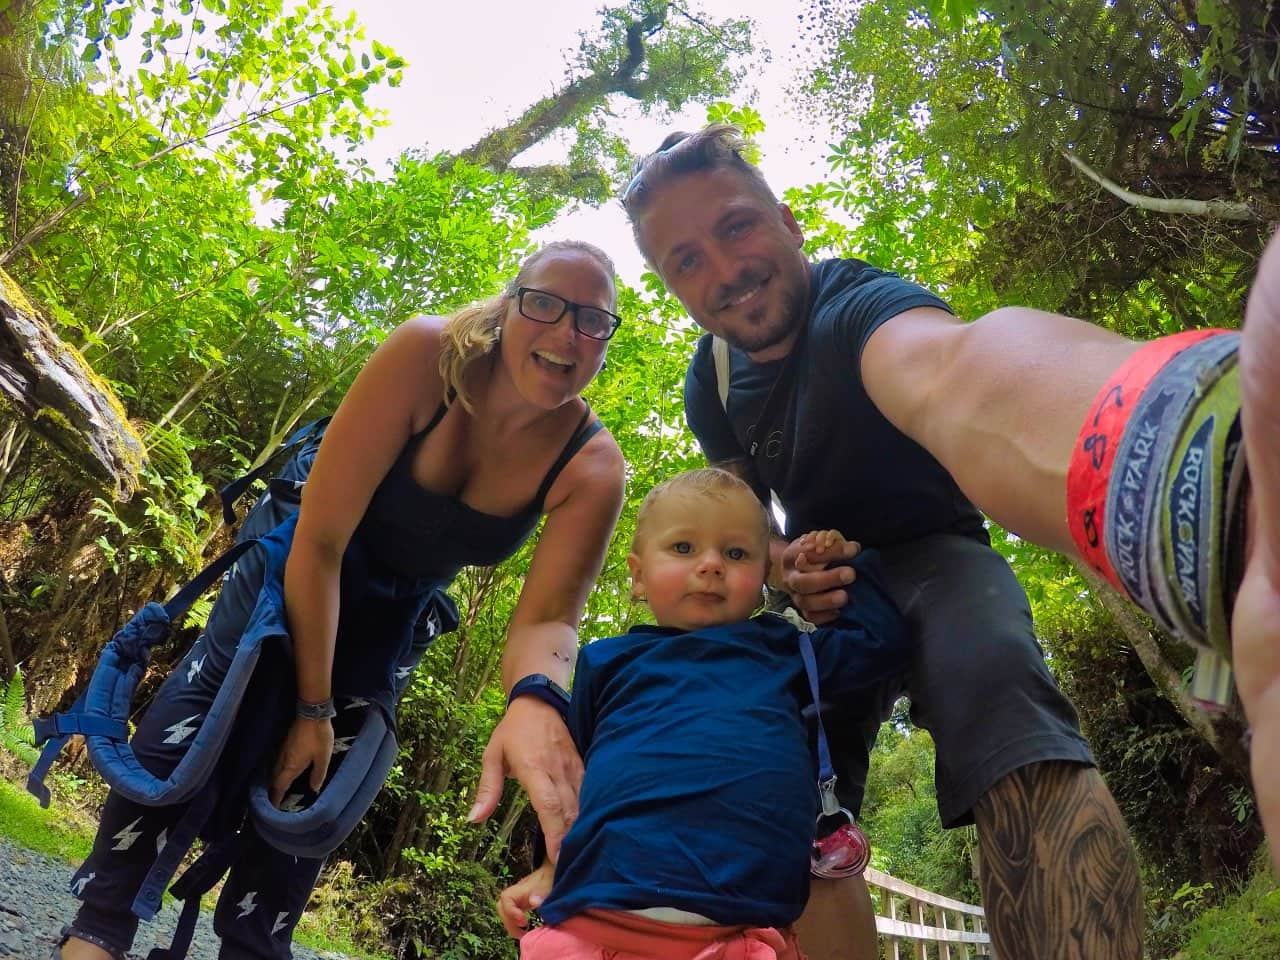 Hokitika-Gorge-Swingbrigde-Trail-selfie-Tabea-Sandy-Sebastian